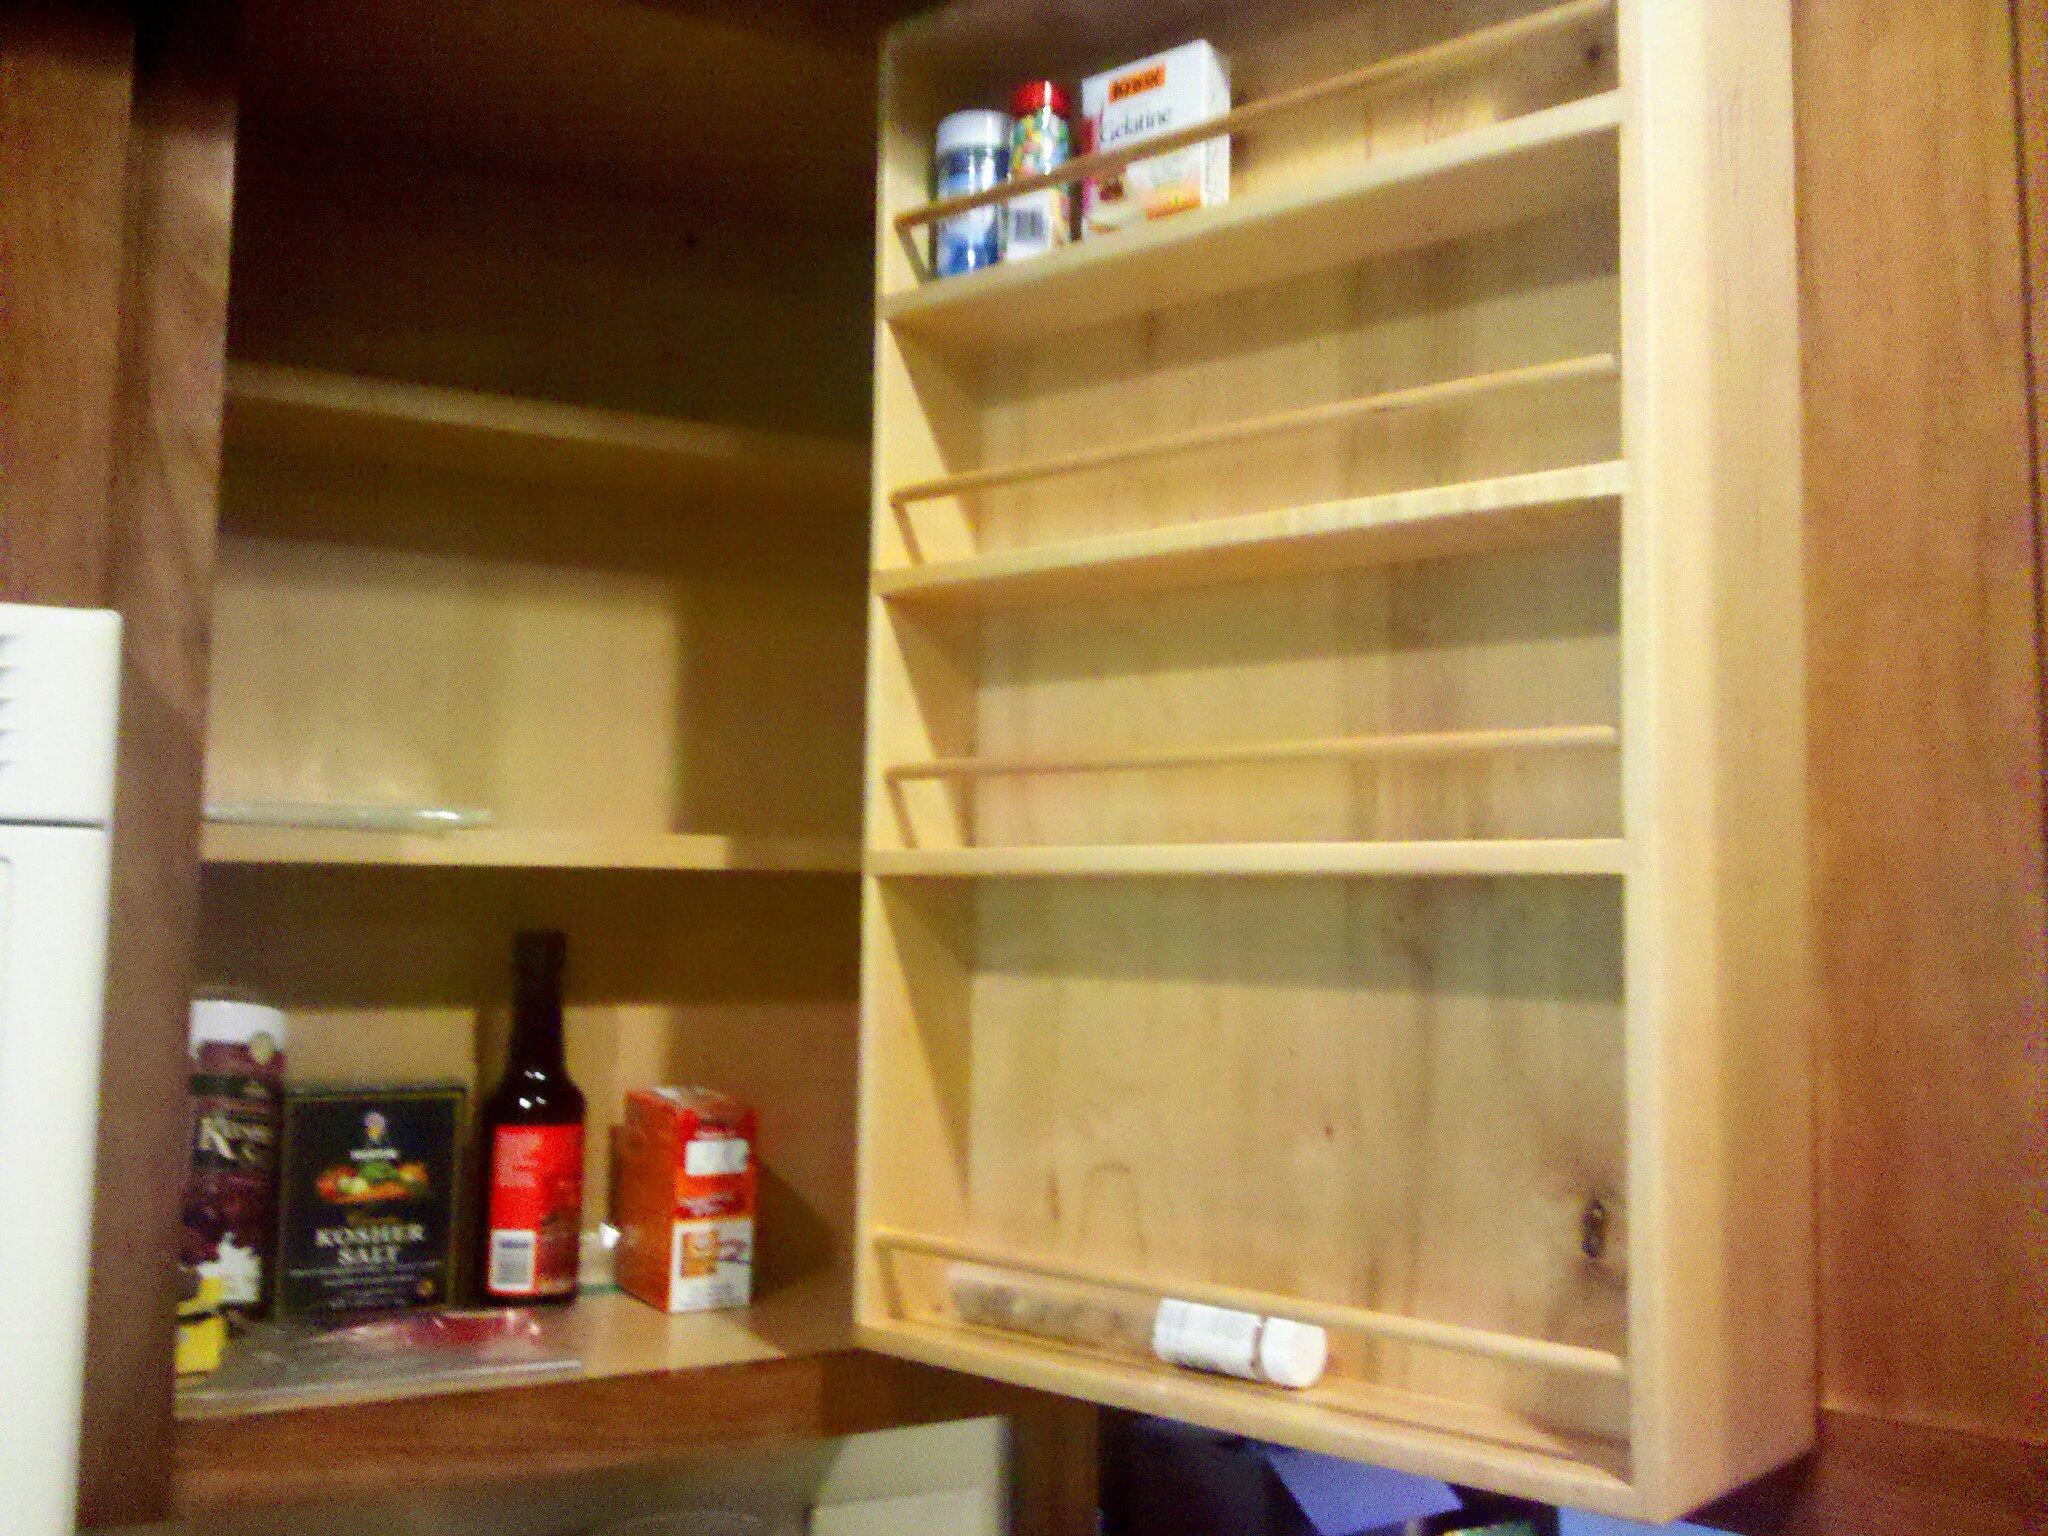 Pimp my Spice Cabinet